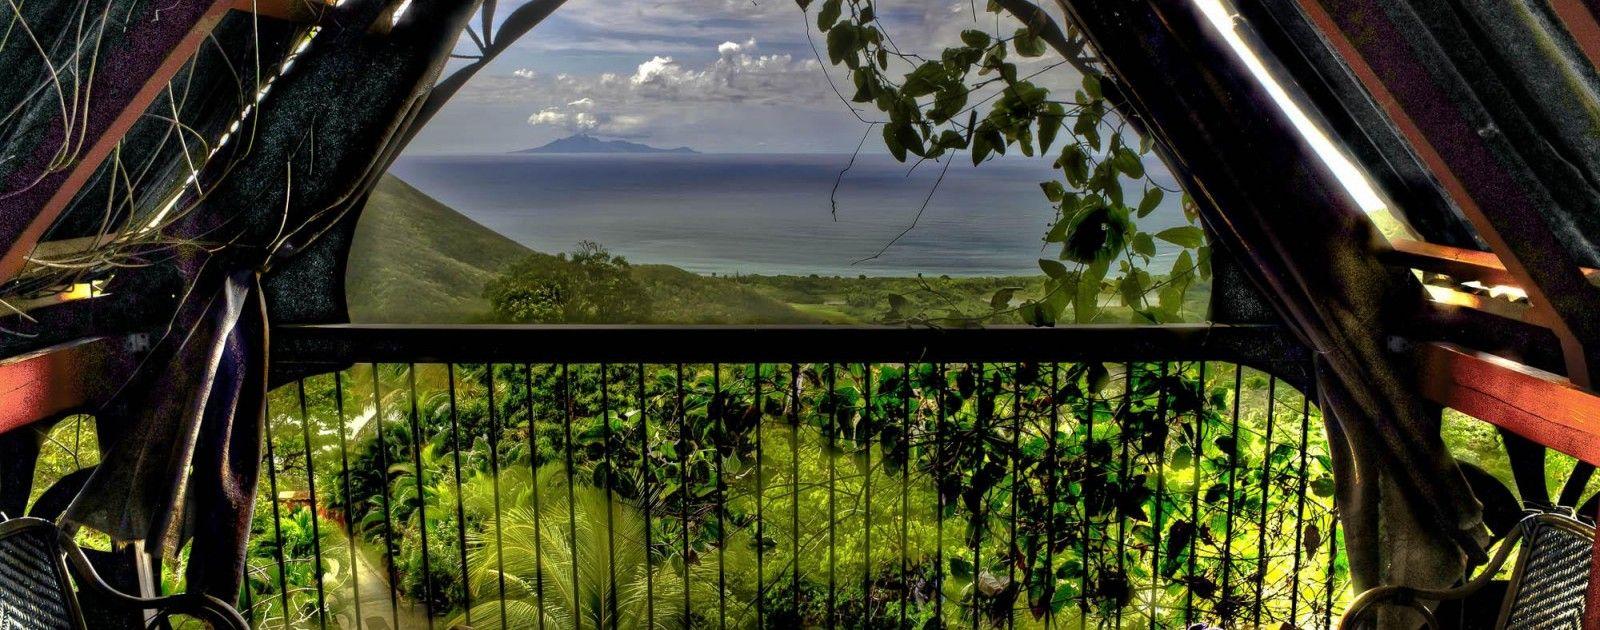 Guadeloupe : http://www.tendacayou.com